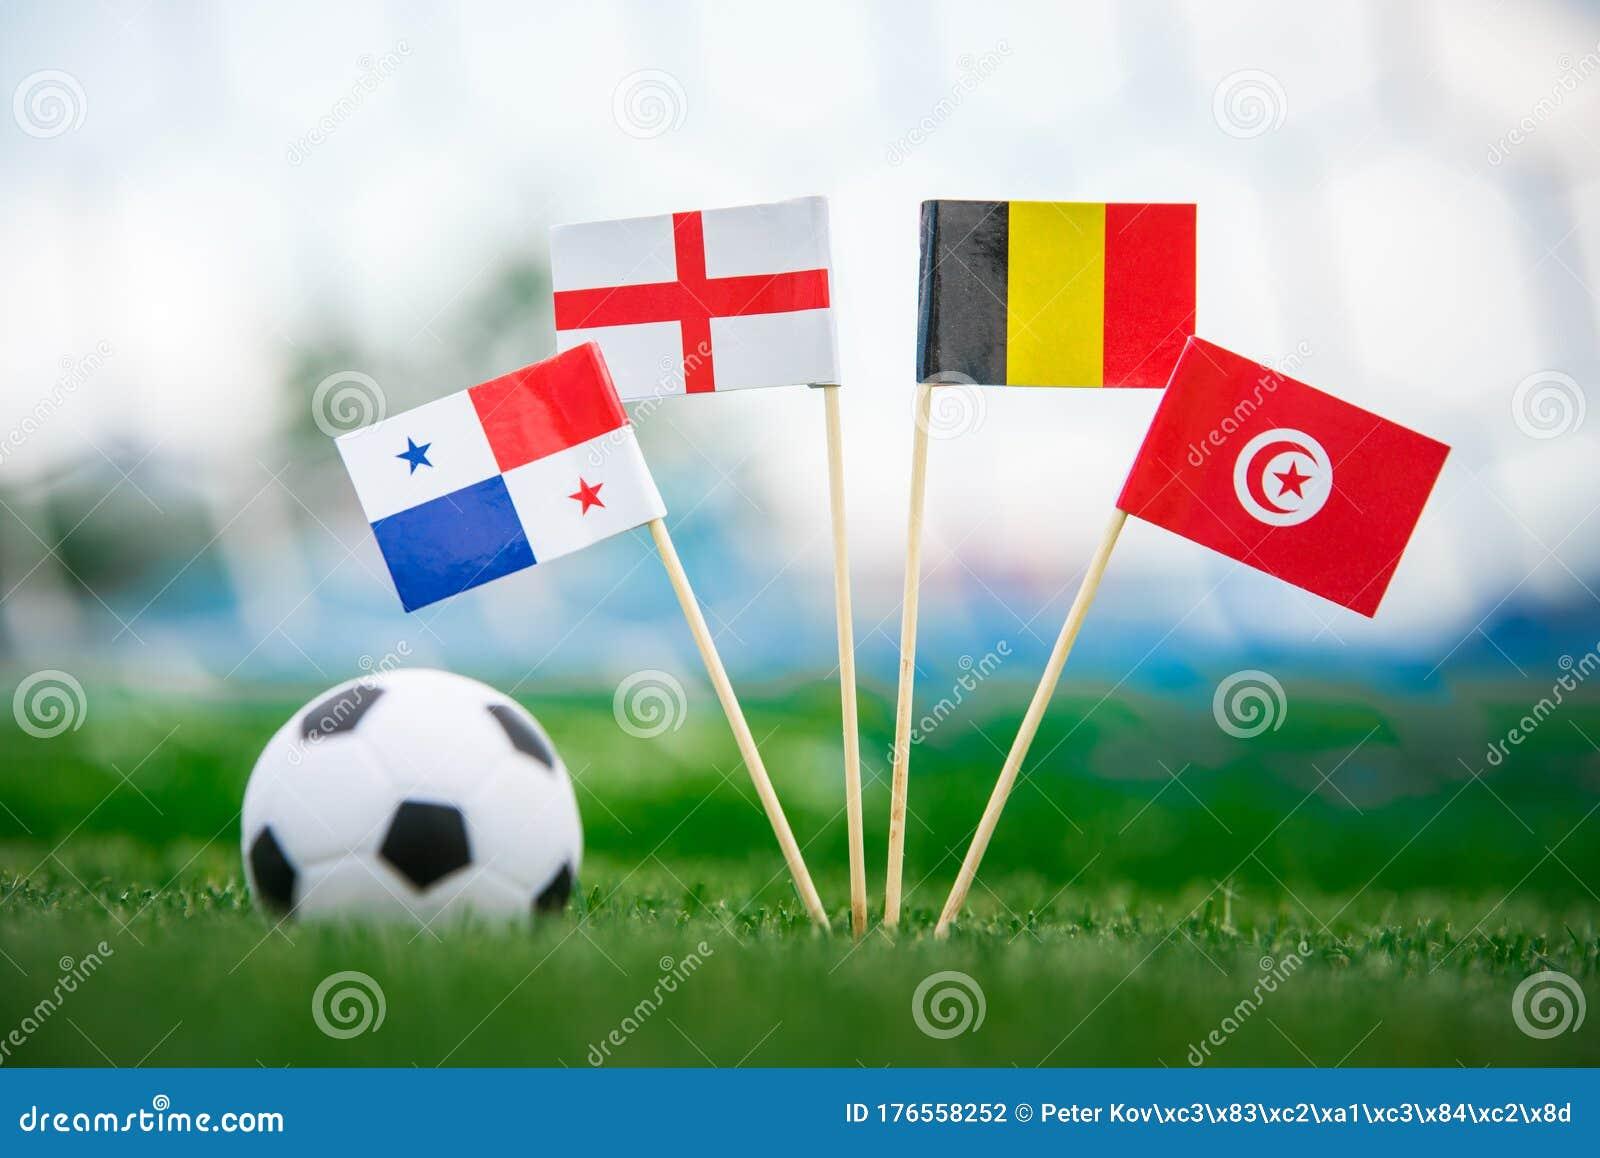 Belgium, Tunisia, England - National Flags On Green ...